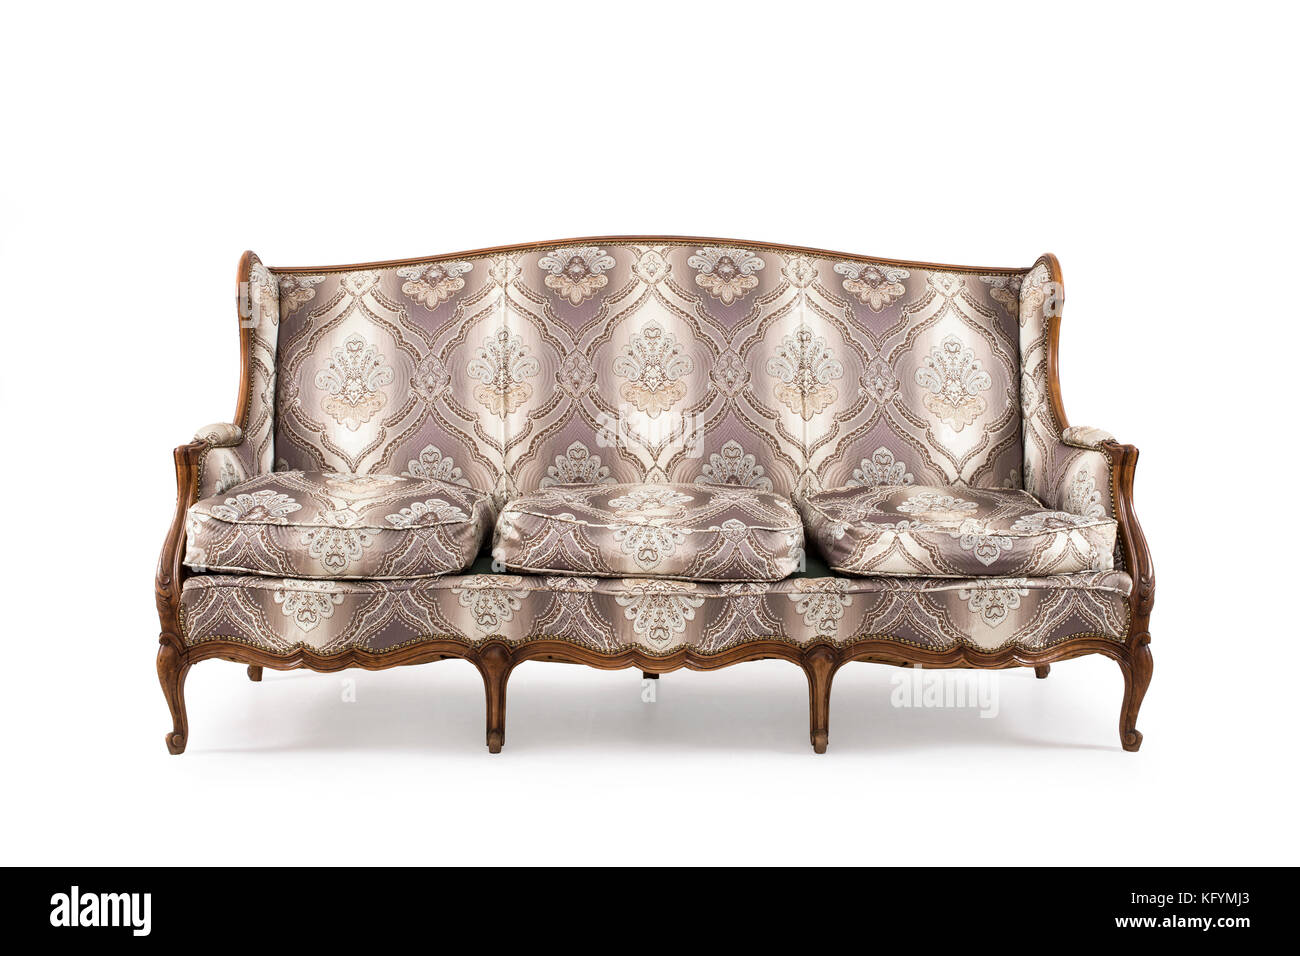 Sofá de madera antiguos sobre fondo blanco. Imagen De Stock